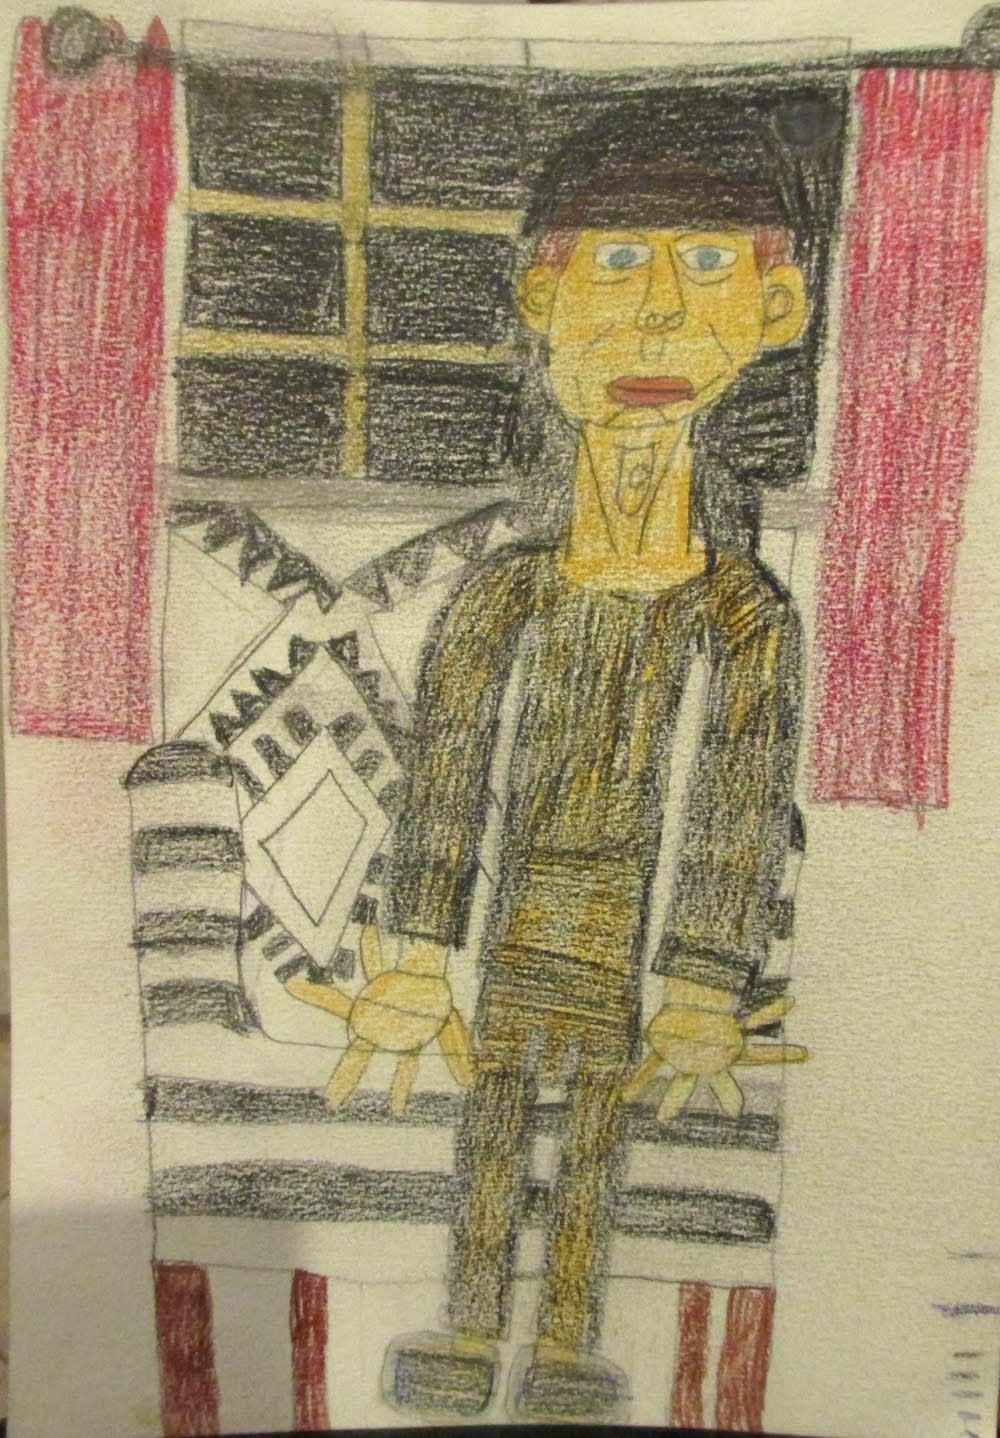 Jessie Drawing by Zion Levy Stewart an artist from Mullumbimby Australia